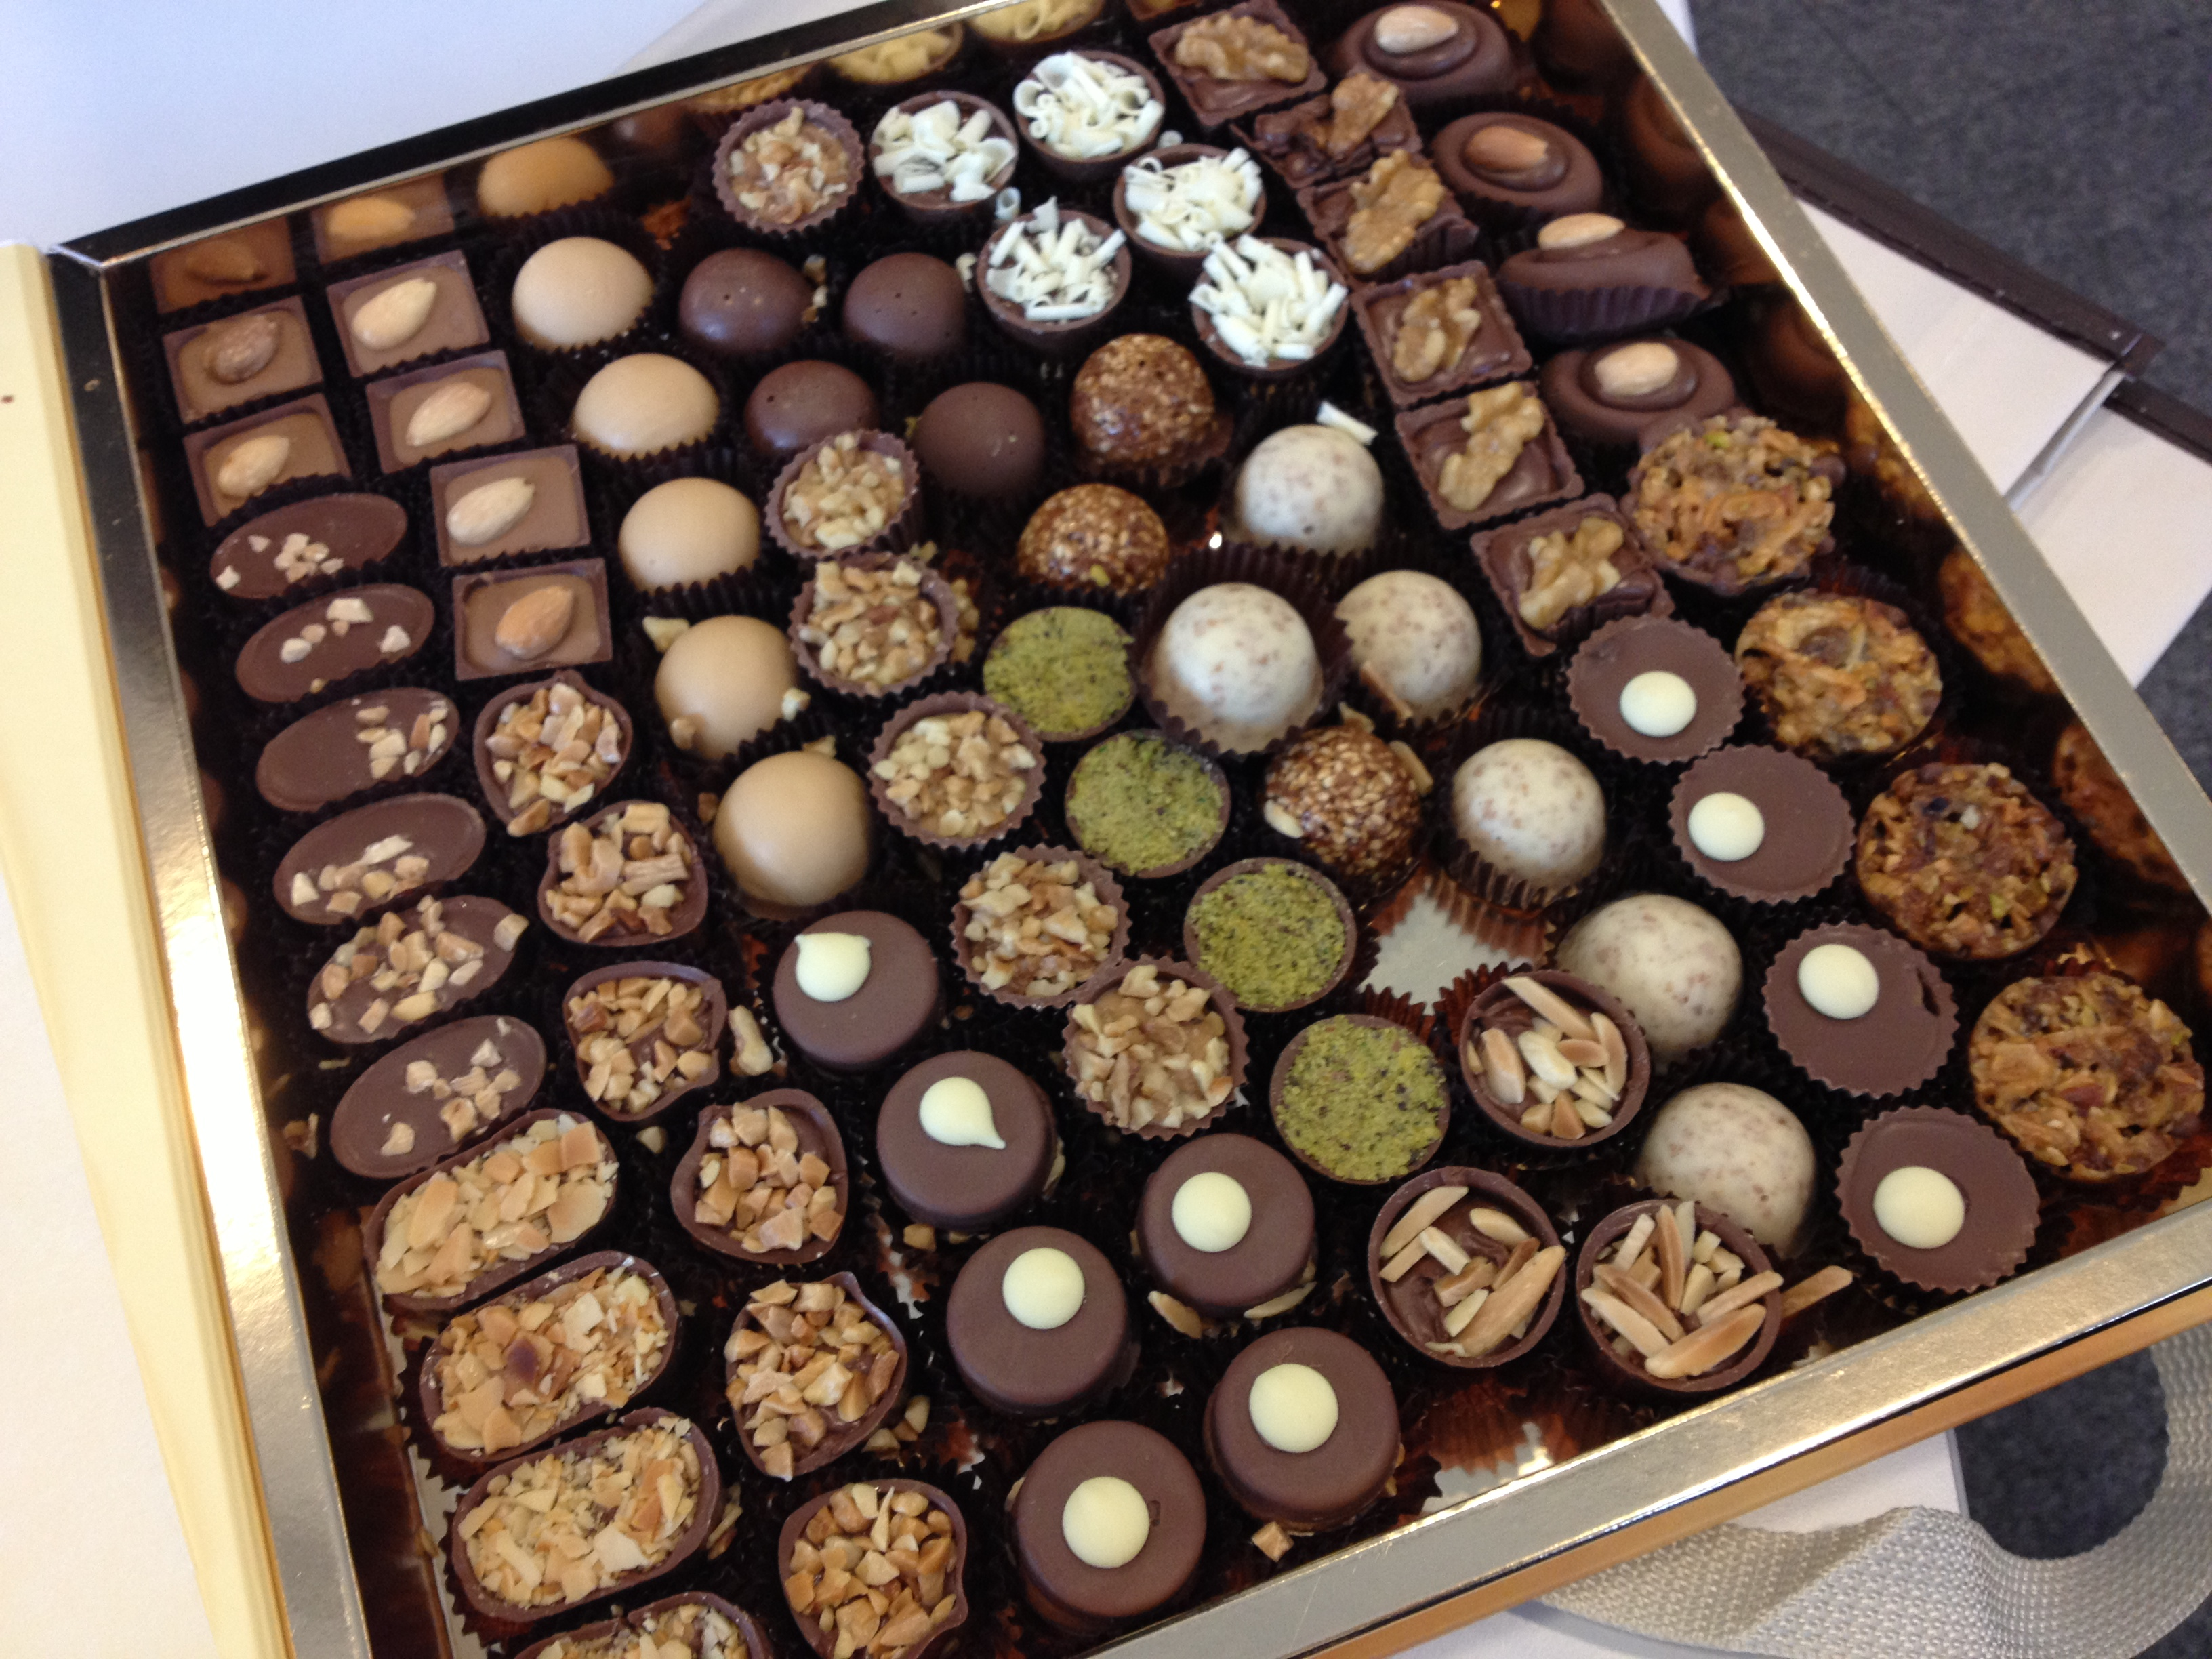 https://foodloader.net/Chu_2013-03-25_Chocolate_for_work.jpg